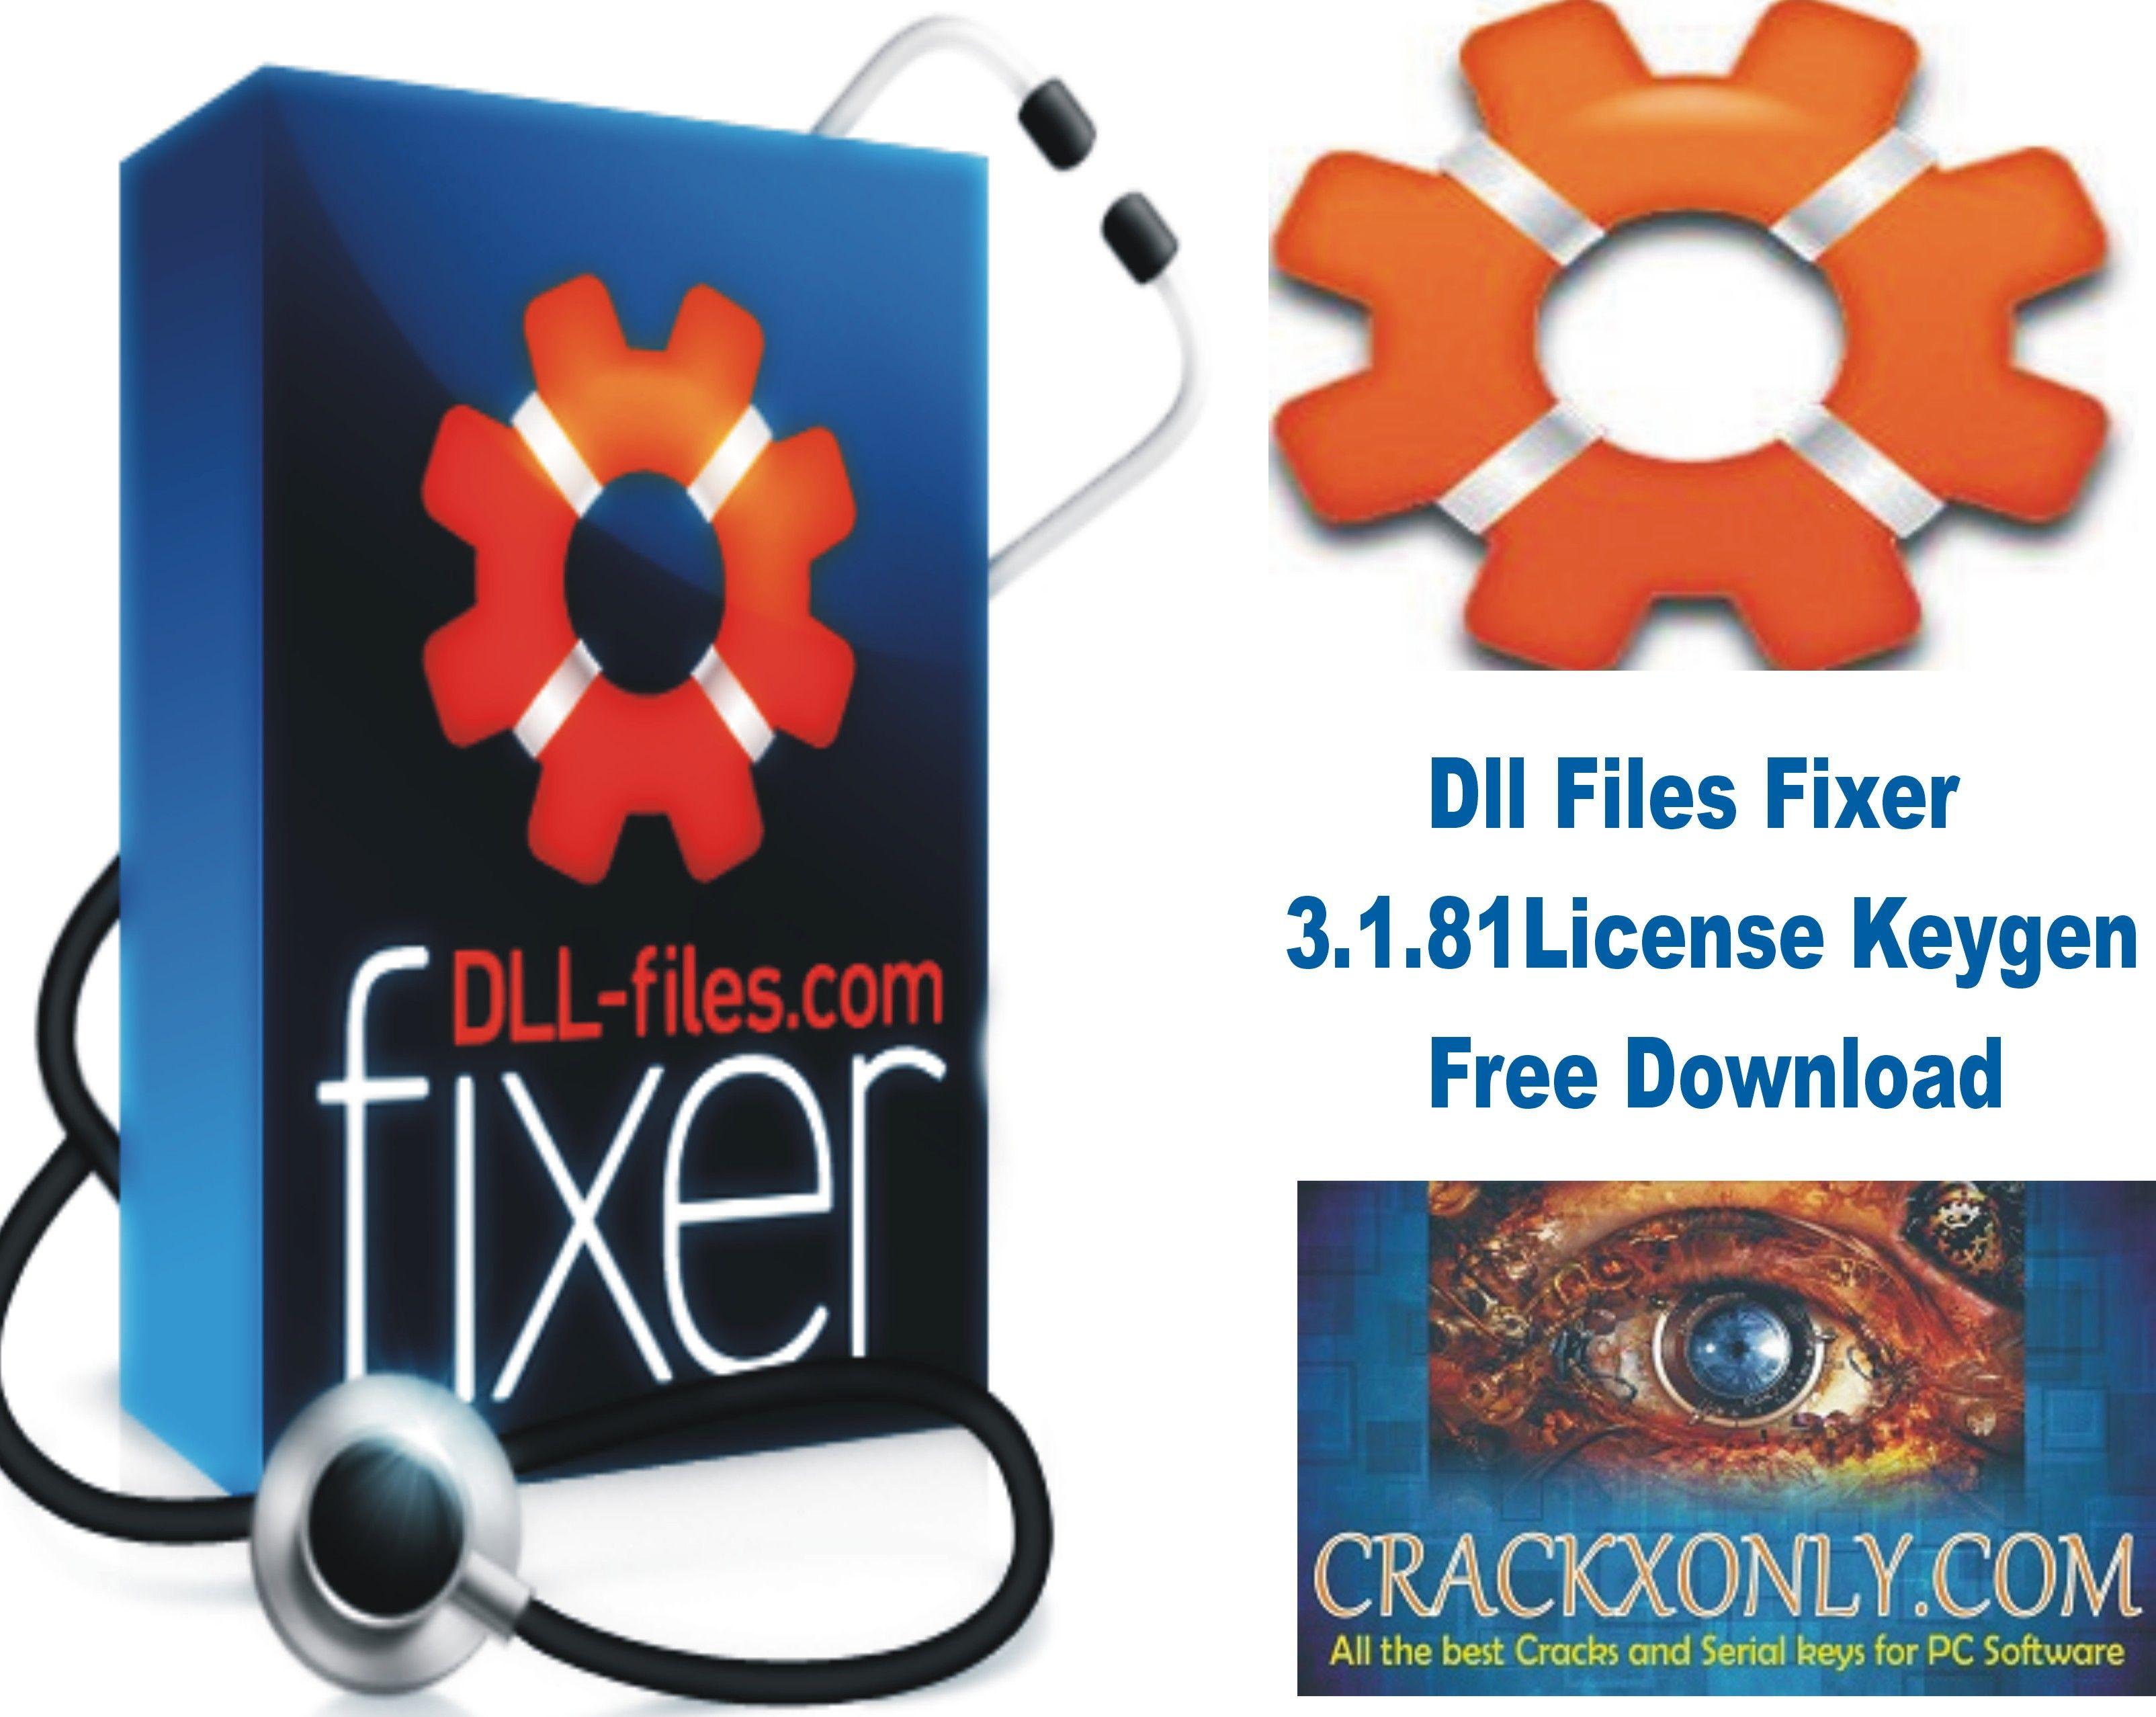 dll-files fixer latest version crack